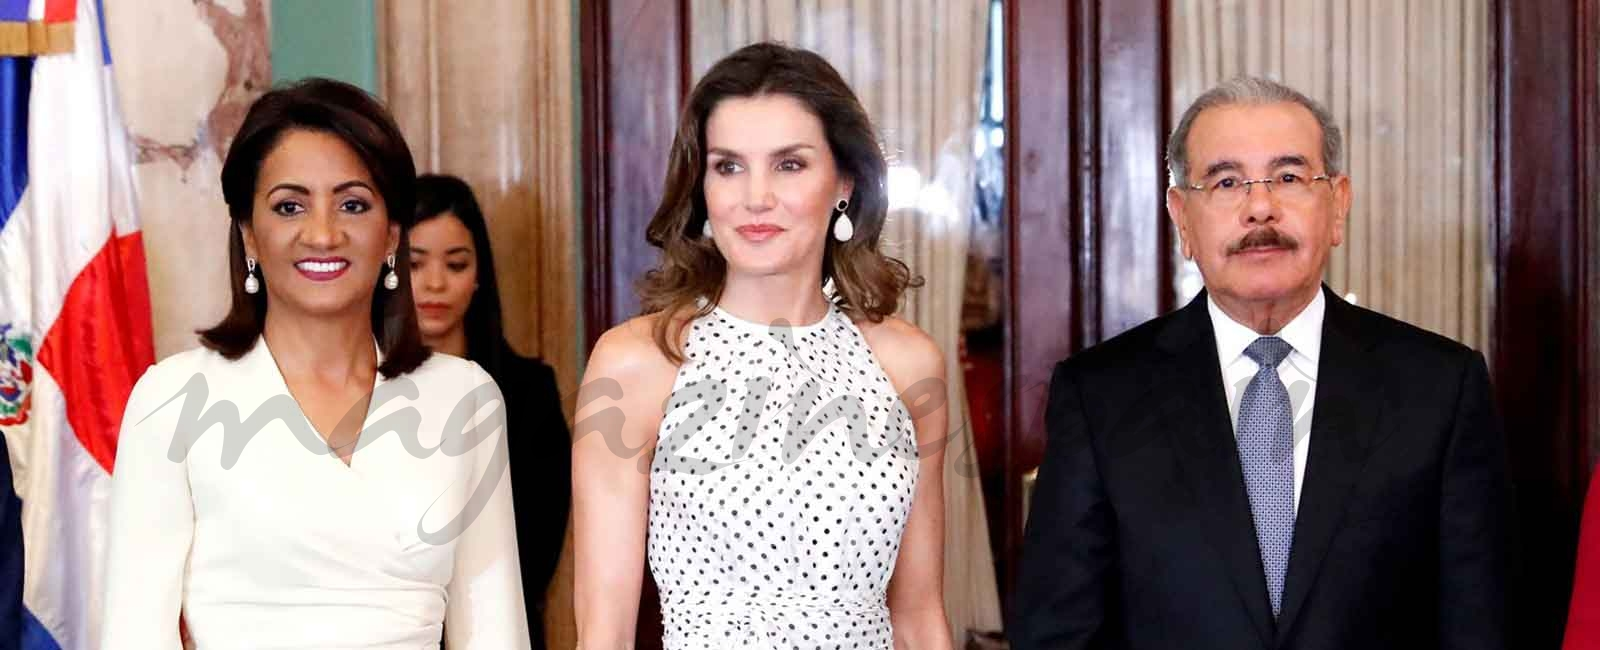 La reina Letizia estrena vestido de lunares de Carolina Herrera